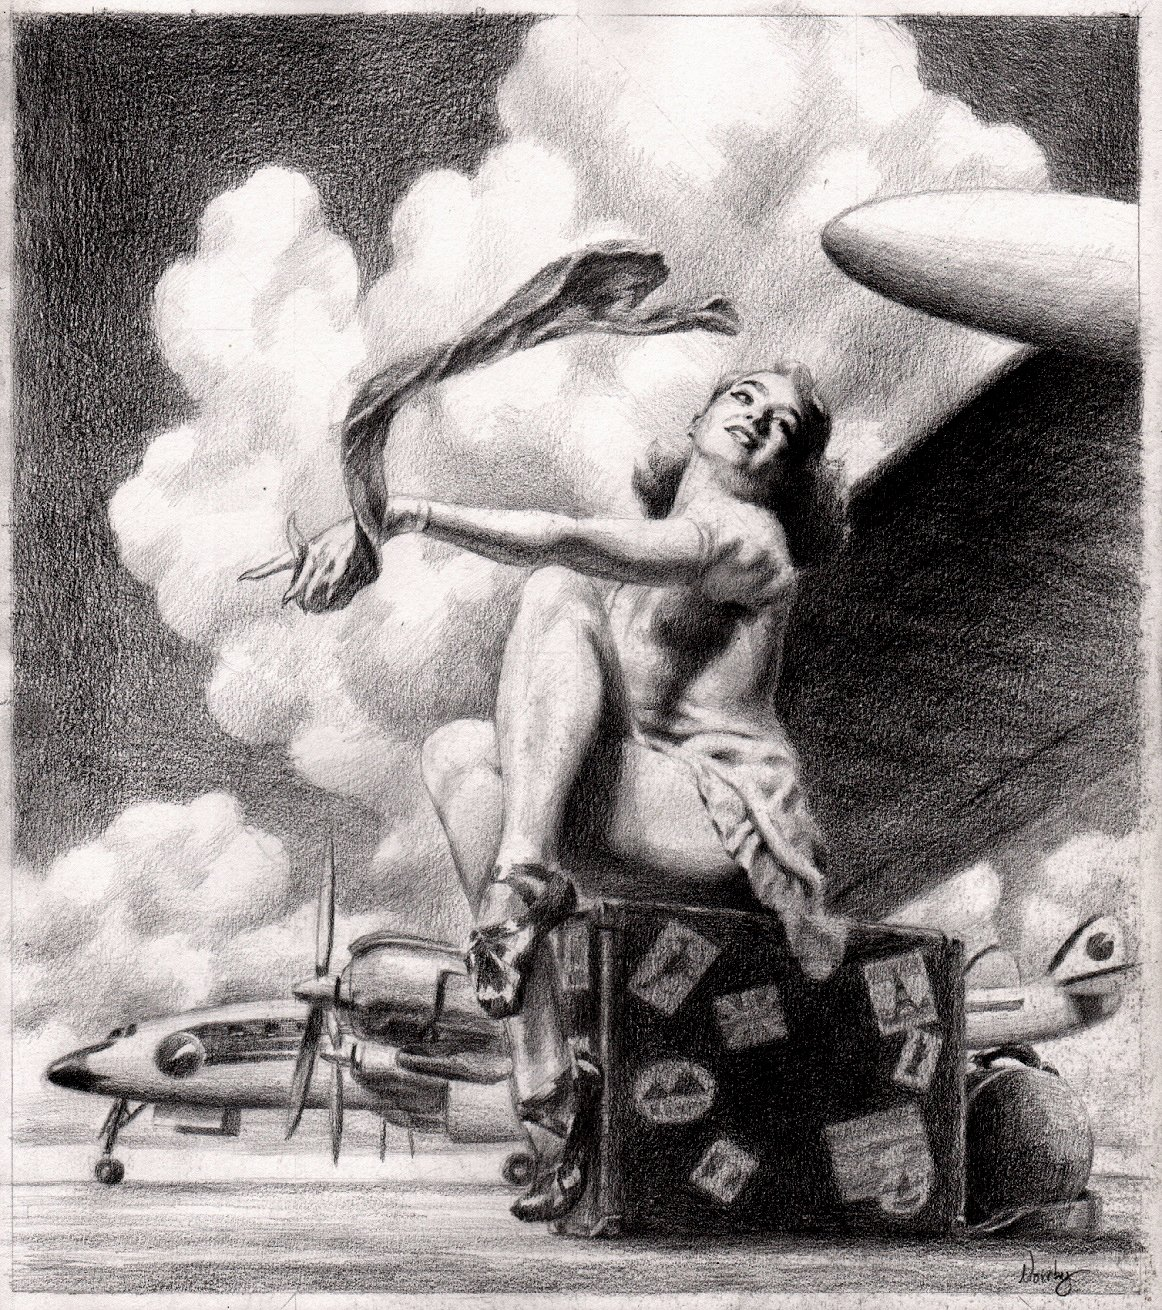 'Cotton Sky' Sexy WW2 Babe Homage Pinup